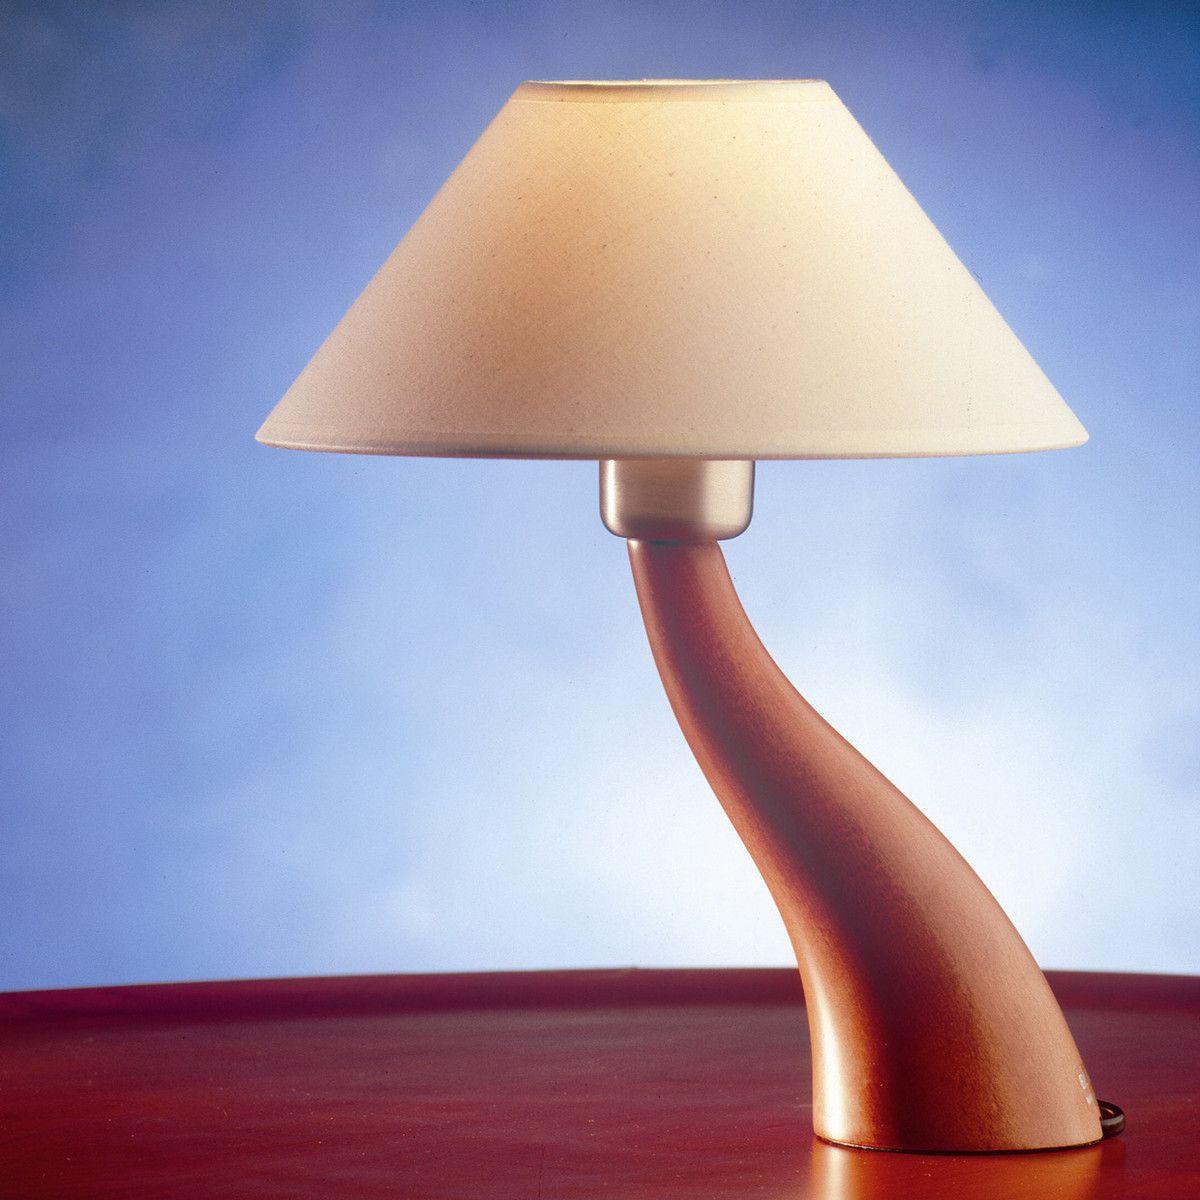 Bonsai Table Lamp Mahogany By Estudio Blauet Lighting